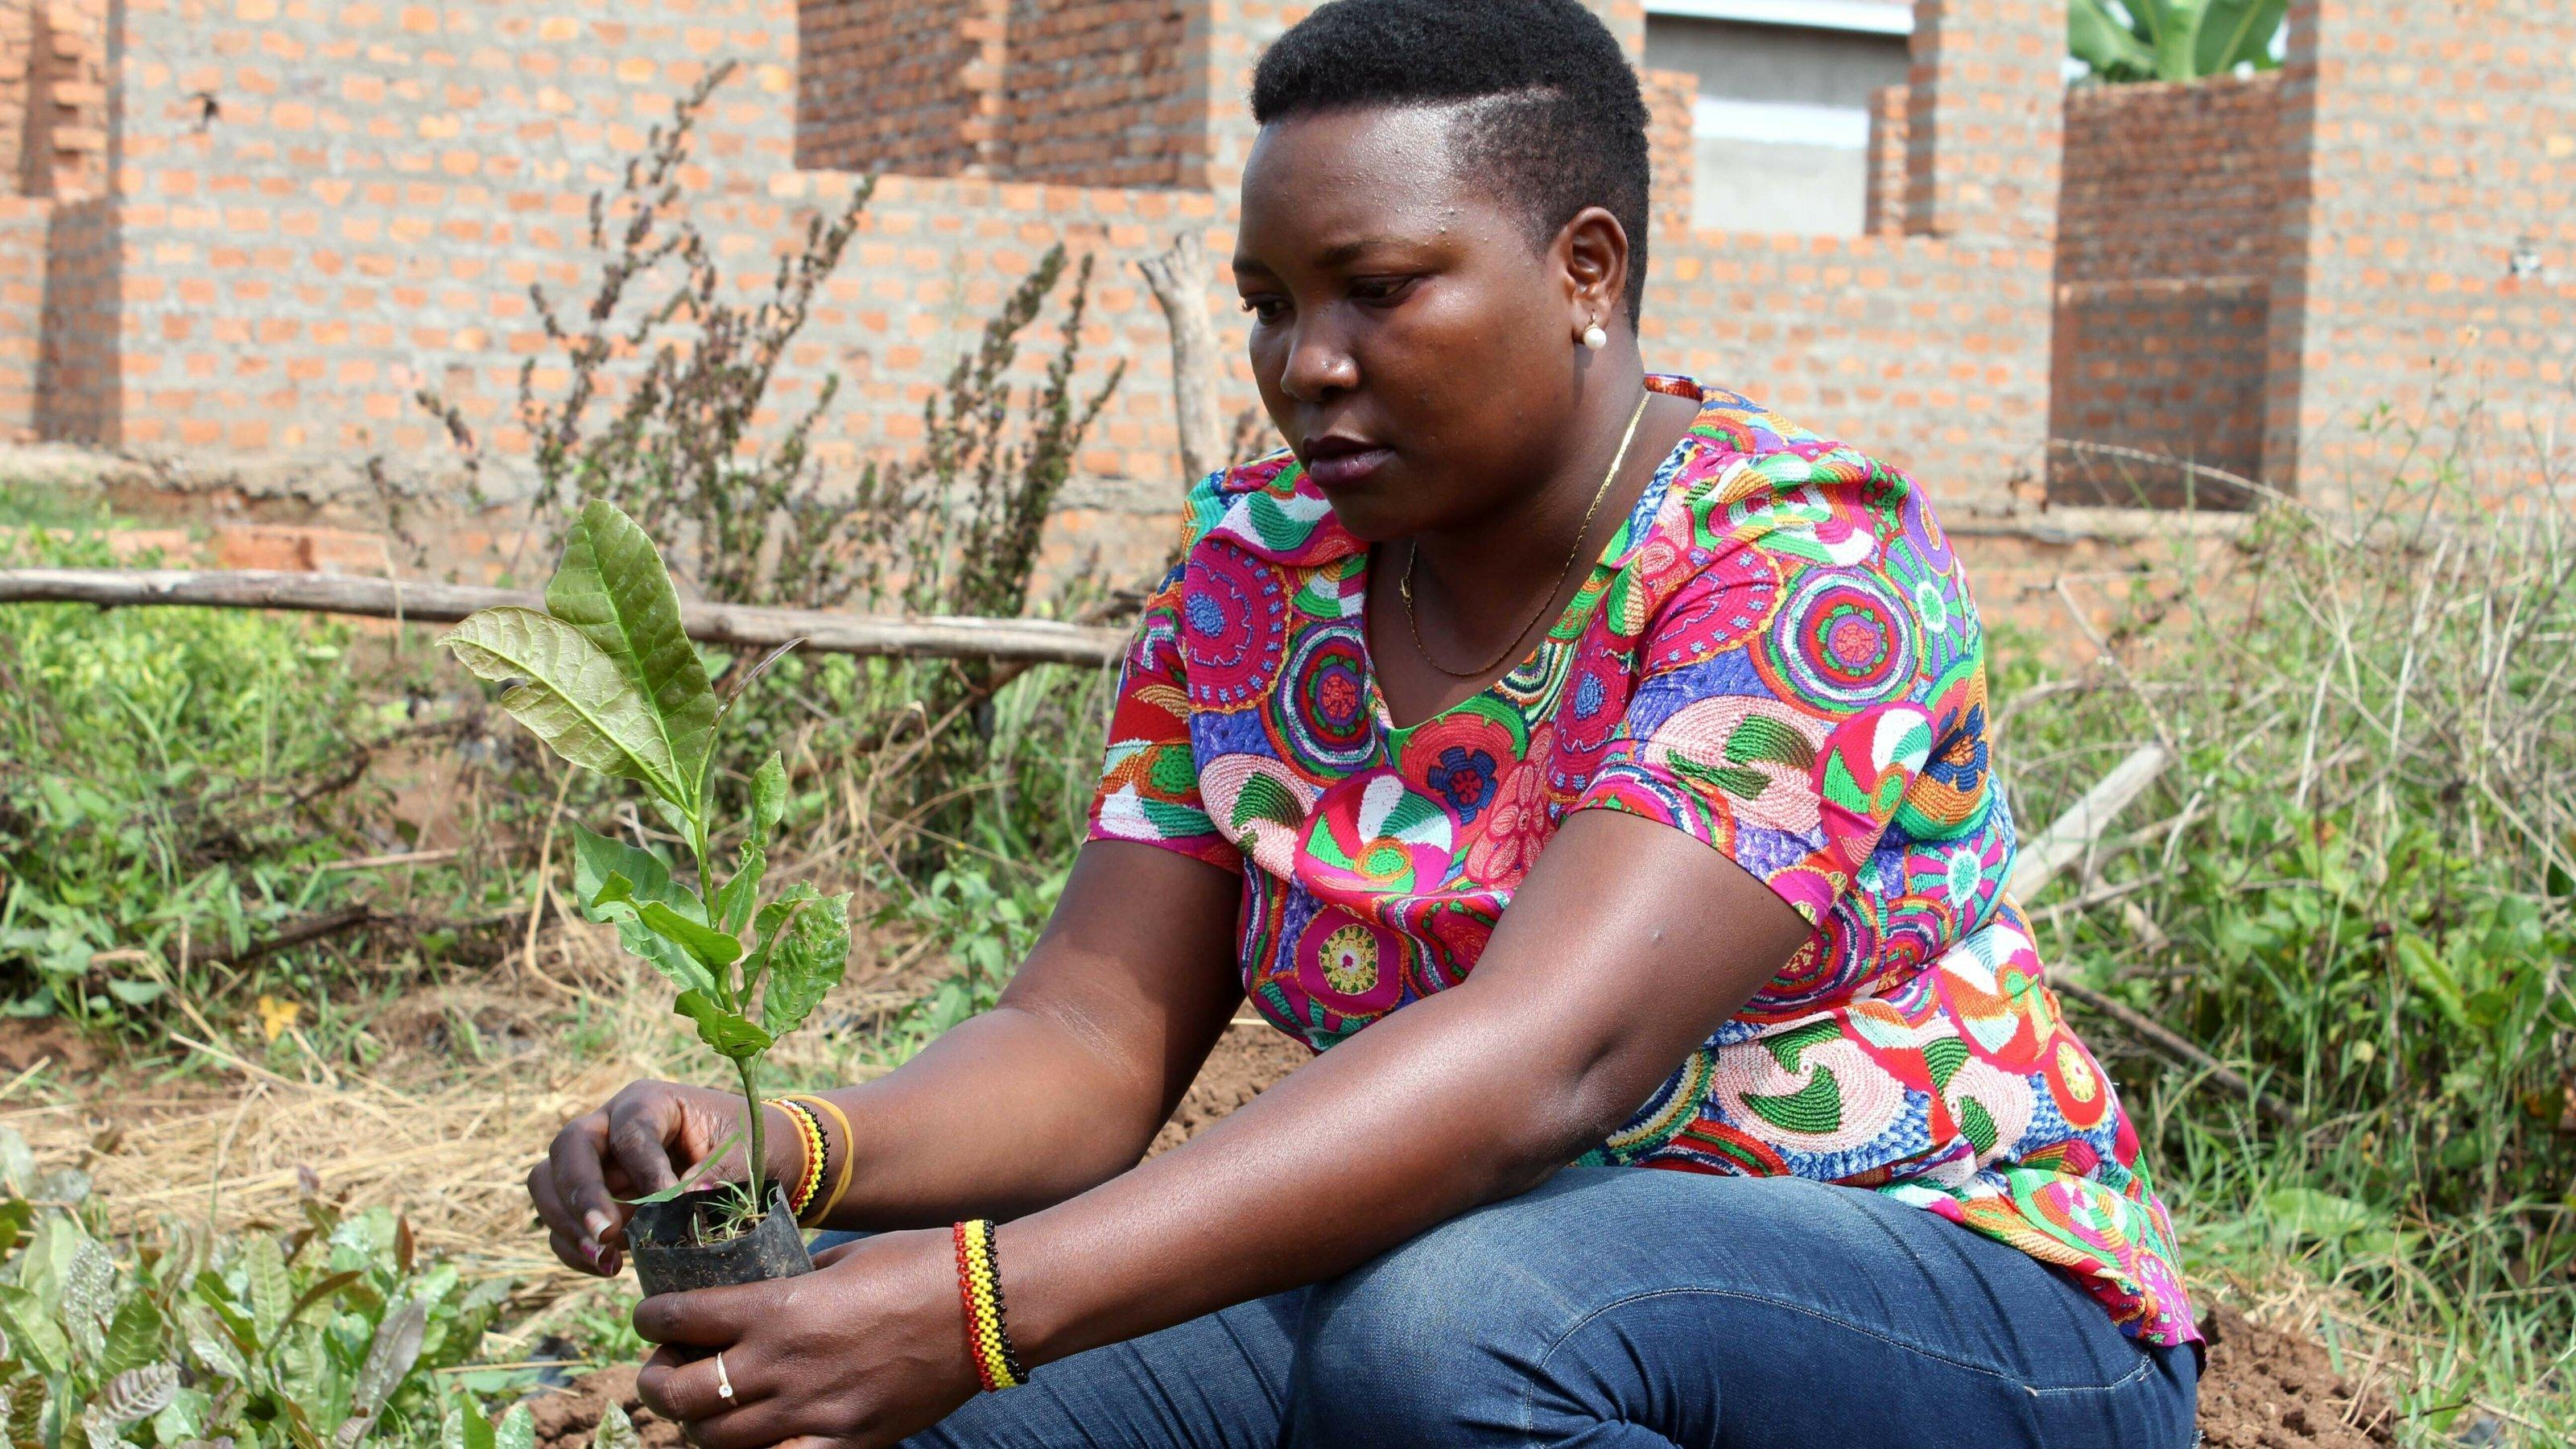 Eine Frau mit einem Setzling in Uganda.